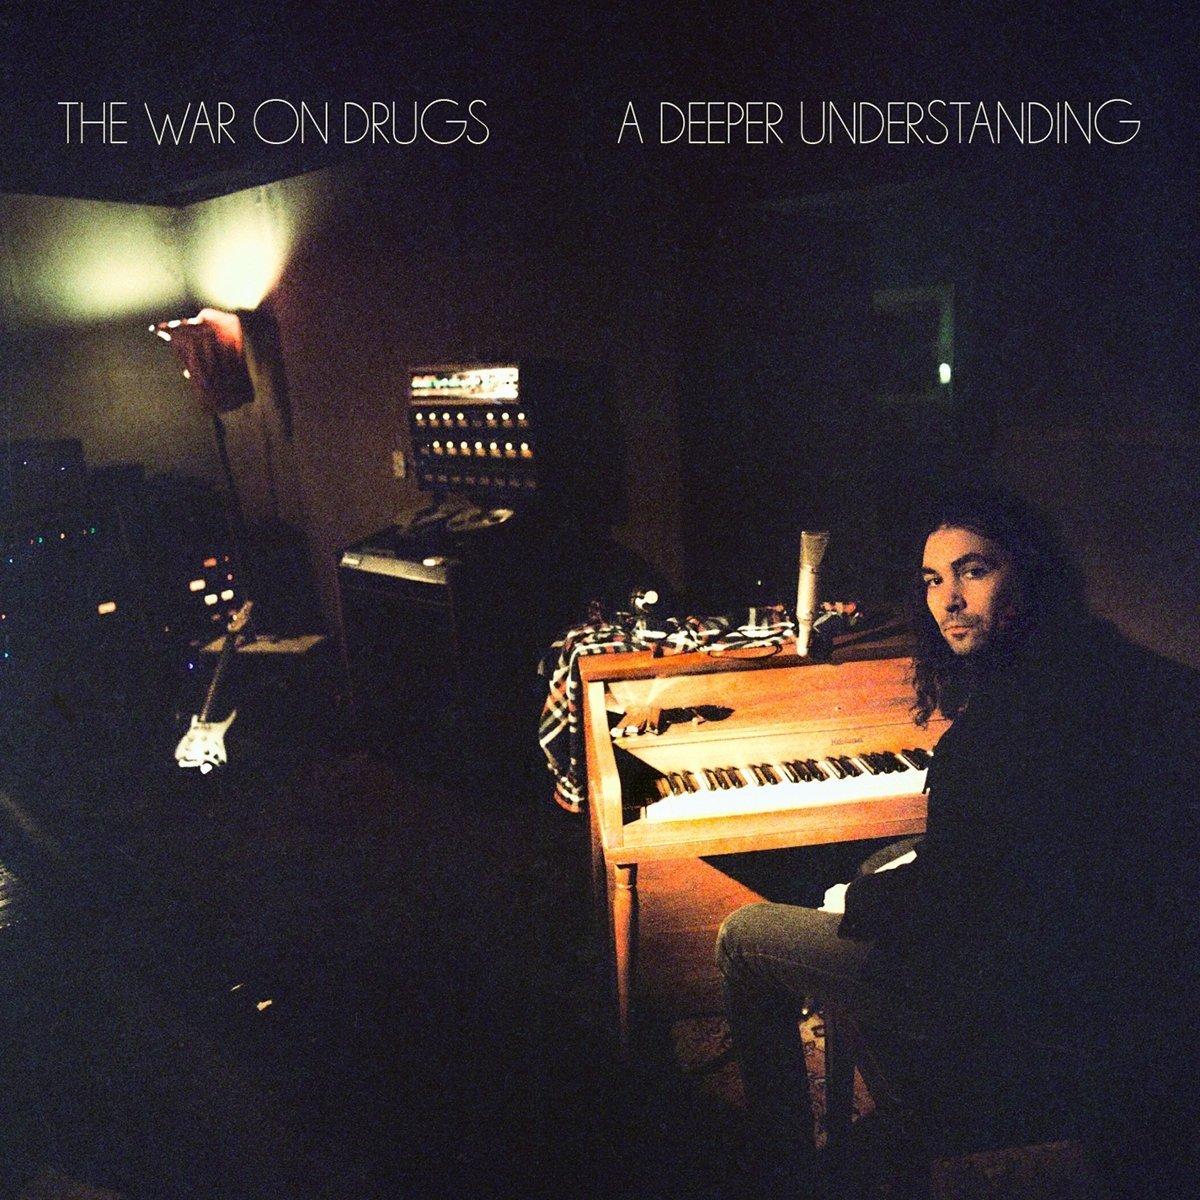 The War On Drugs: A Deeper Understanding [Album Review]